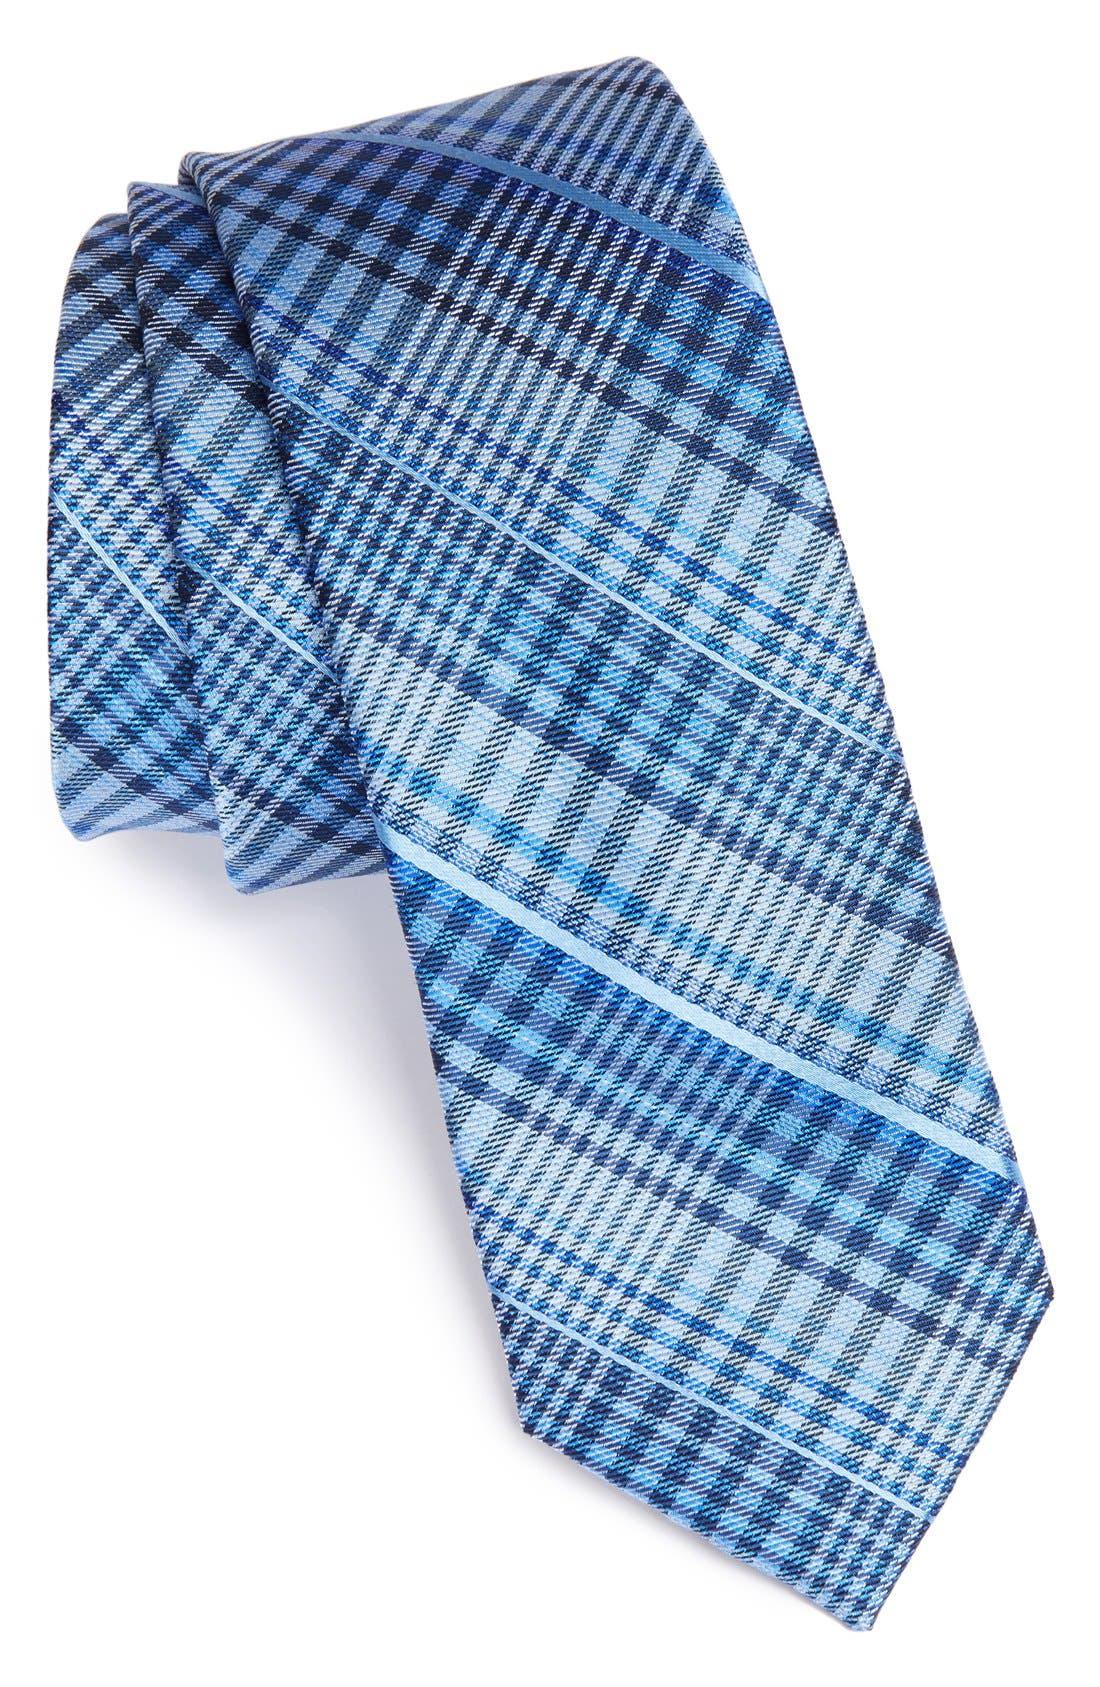 Main Image - 1901 'Davis' Woven Silk Tie